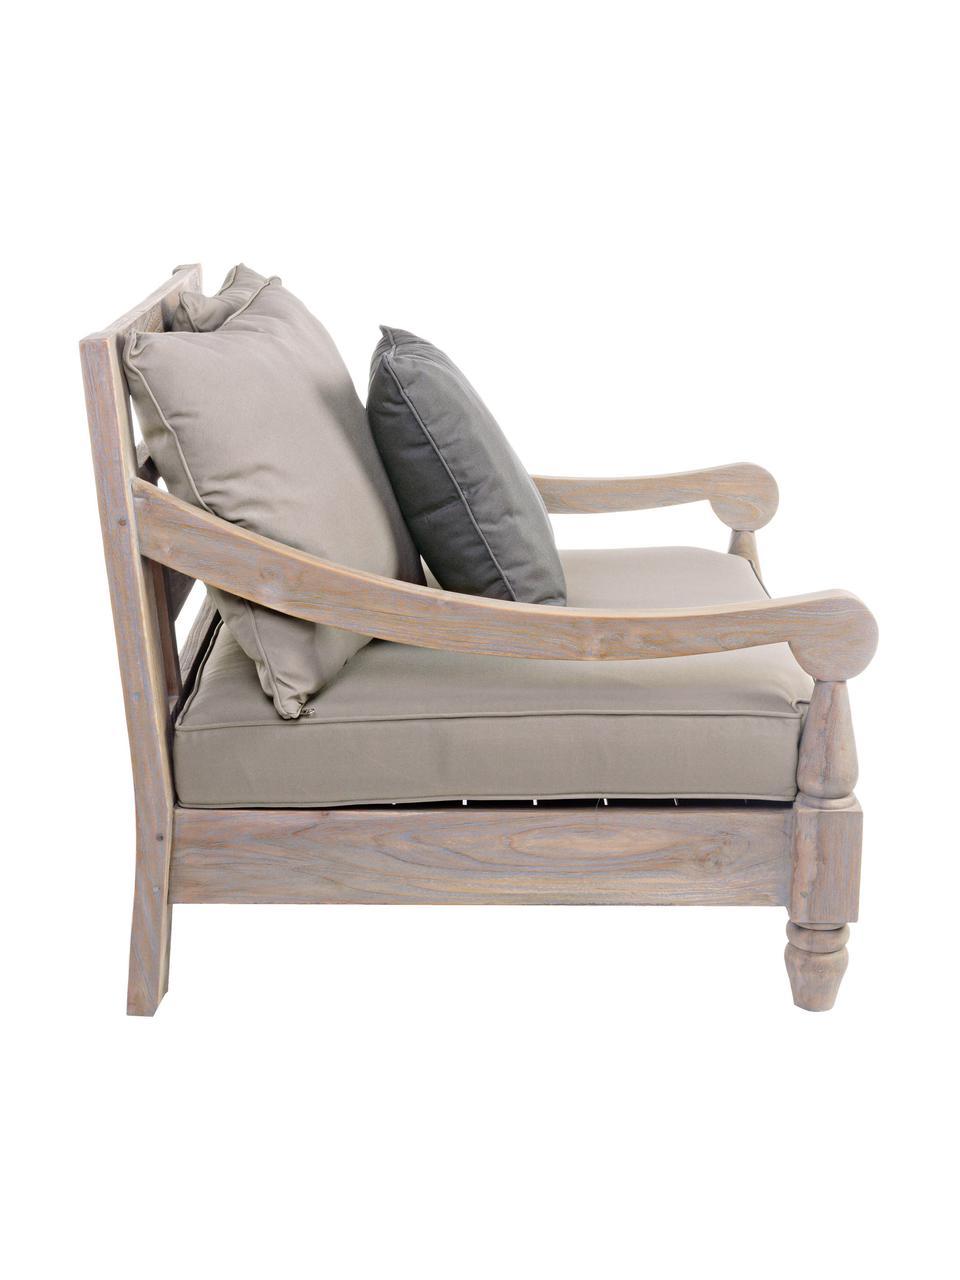 Tuinloungefauteuil  Bali  van teakhout, Frame: teakhout, Bekleding: 100% polyester, UV- en wa, Rood, 90 x 90 cm